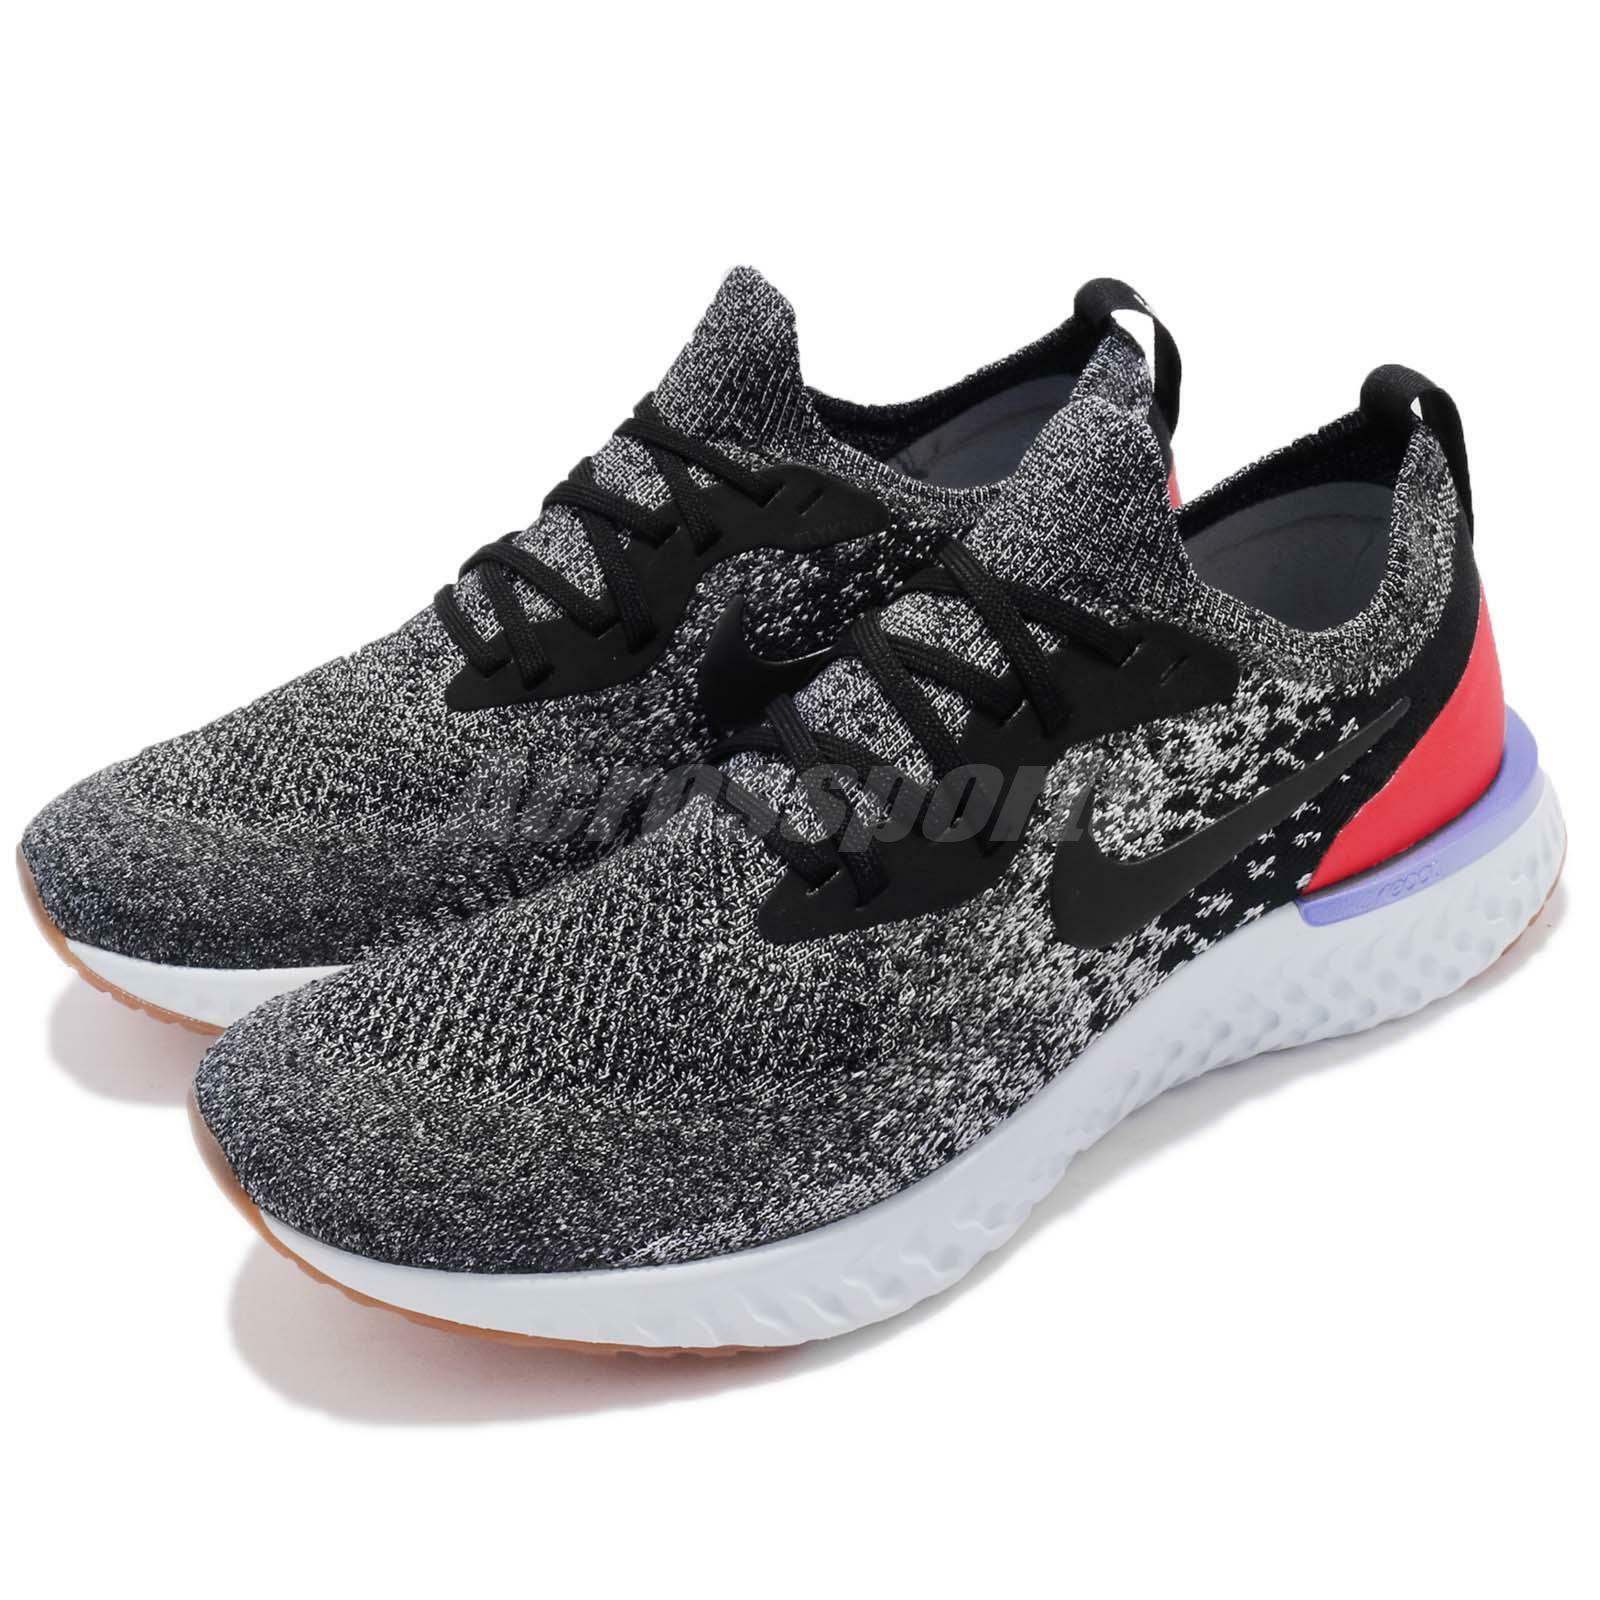 Nike Epic React Flyknit noir blanc Orbit  Gris  homme fonctionnement Sneakers AQ0067-006